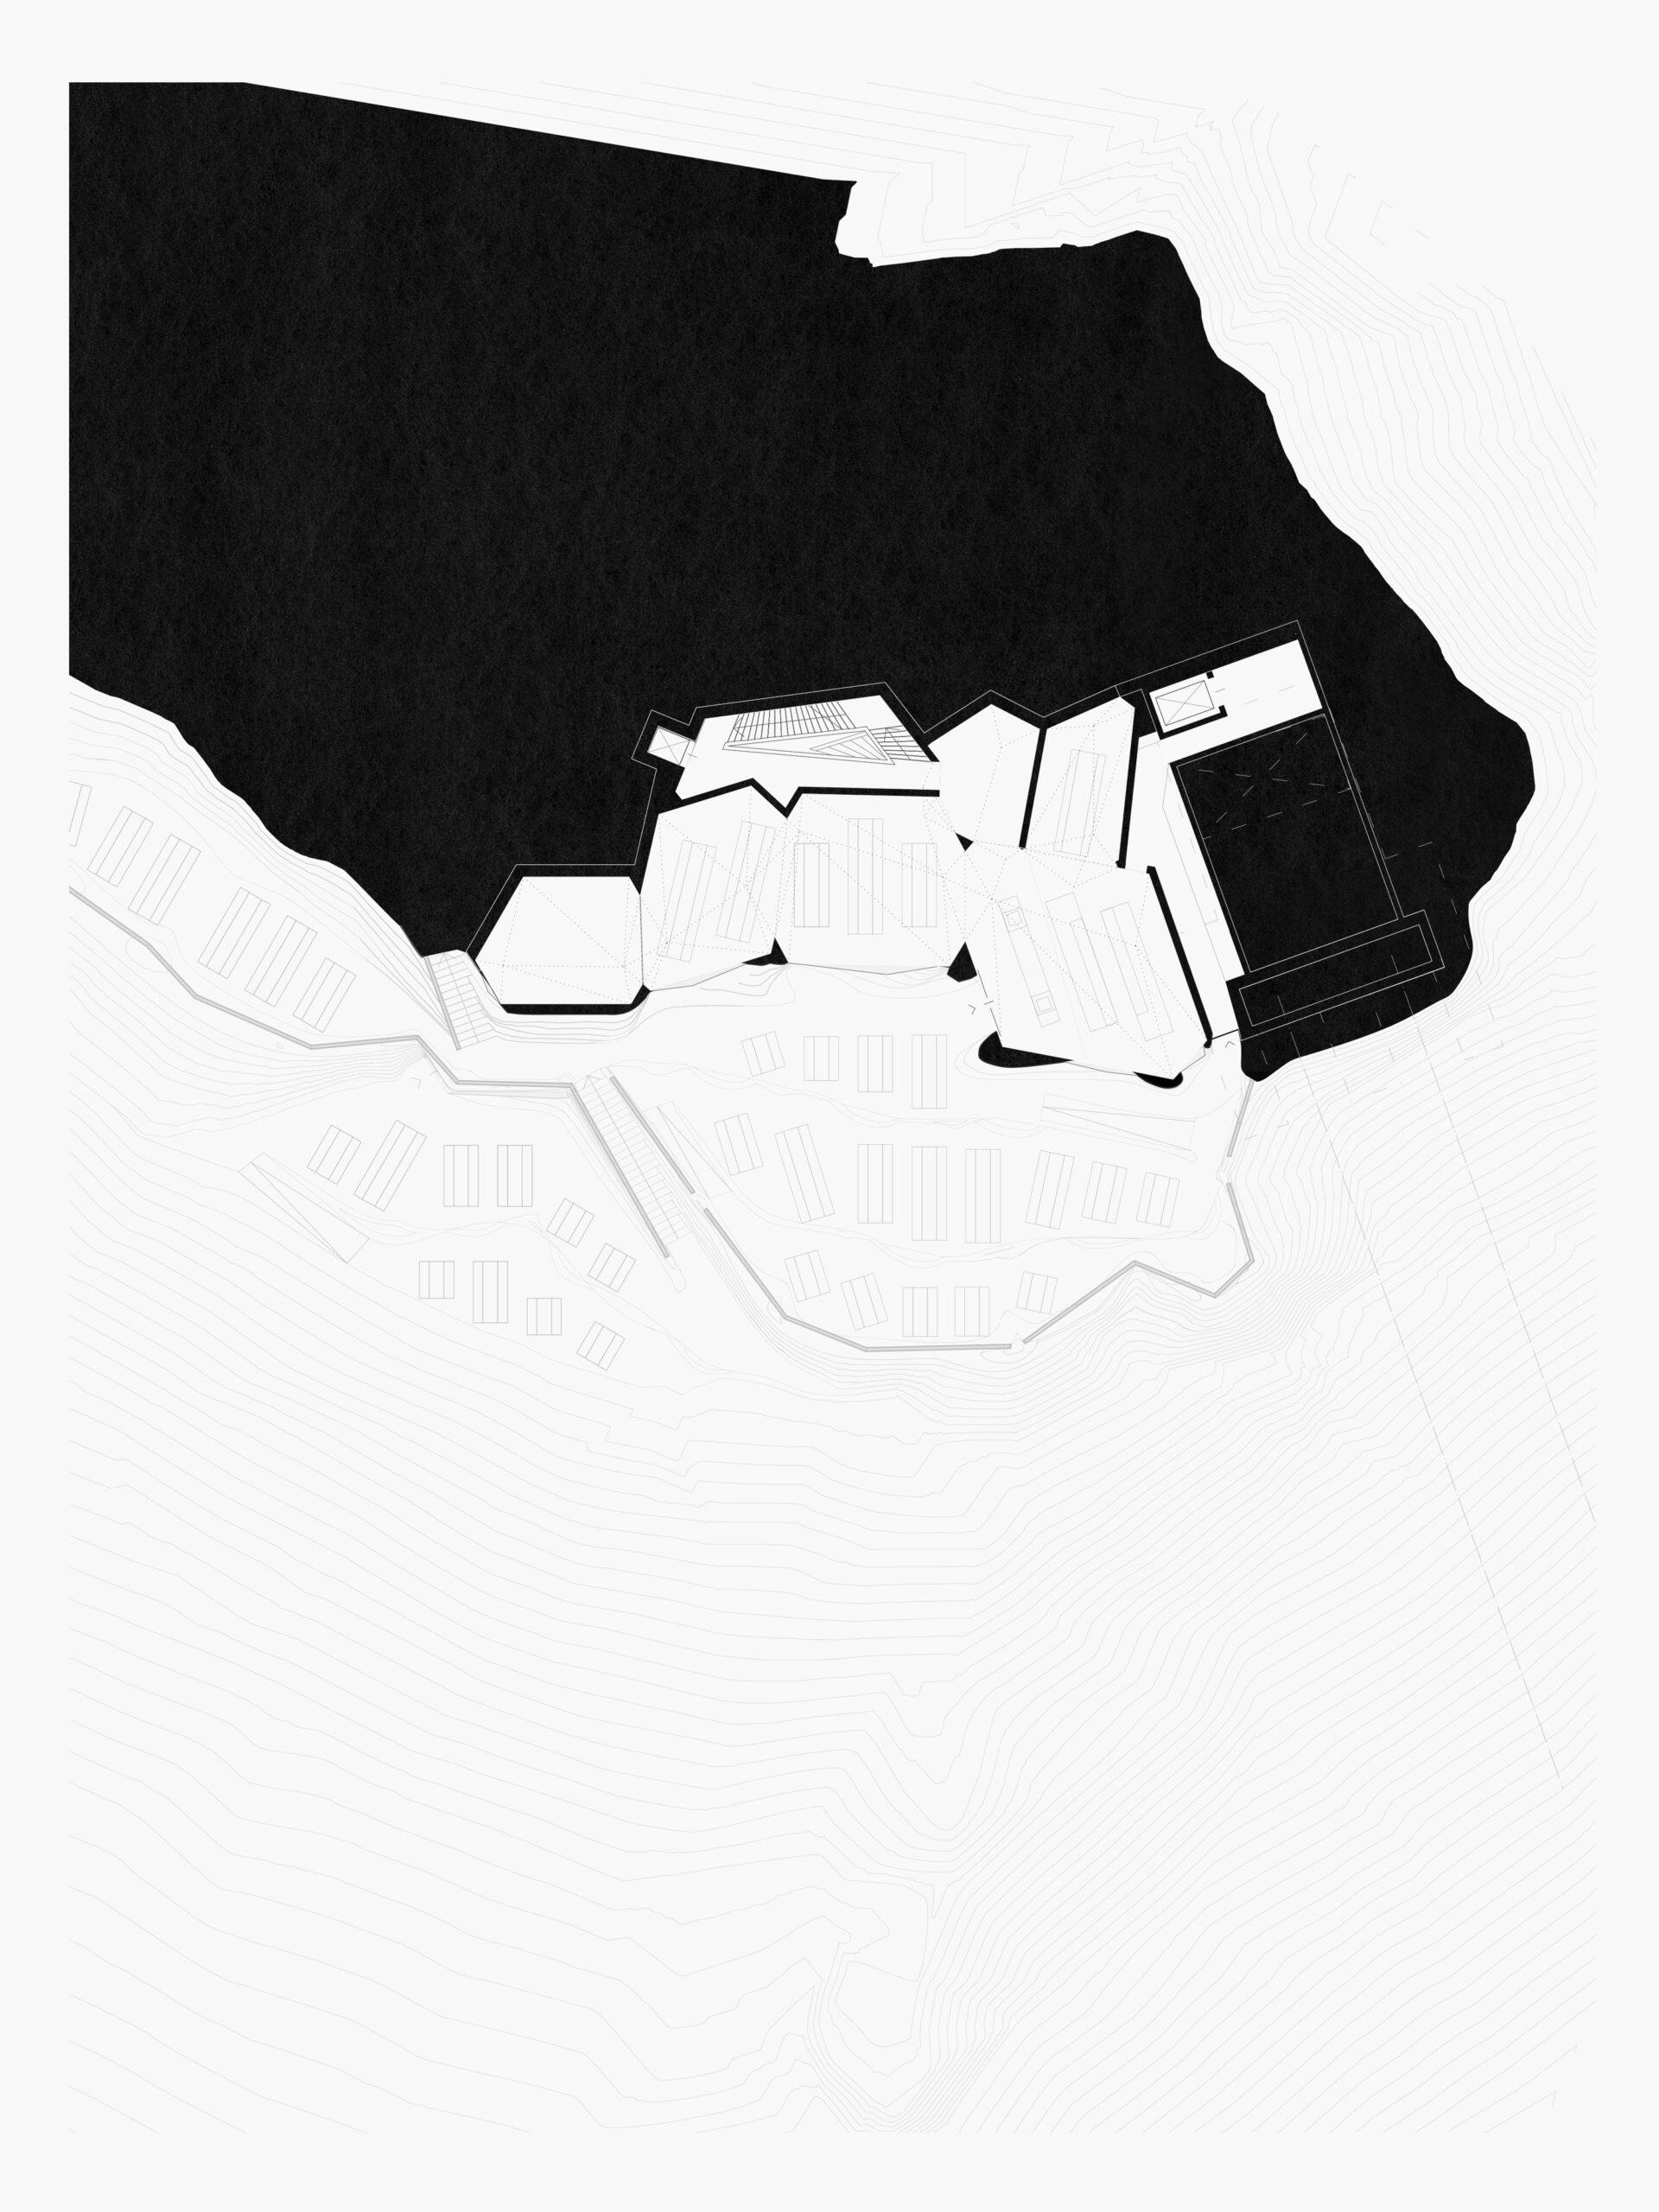 Michael-Becker-Architects-Architekten-Gipfelstation-Nebelhorn-Grundriss-1